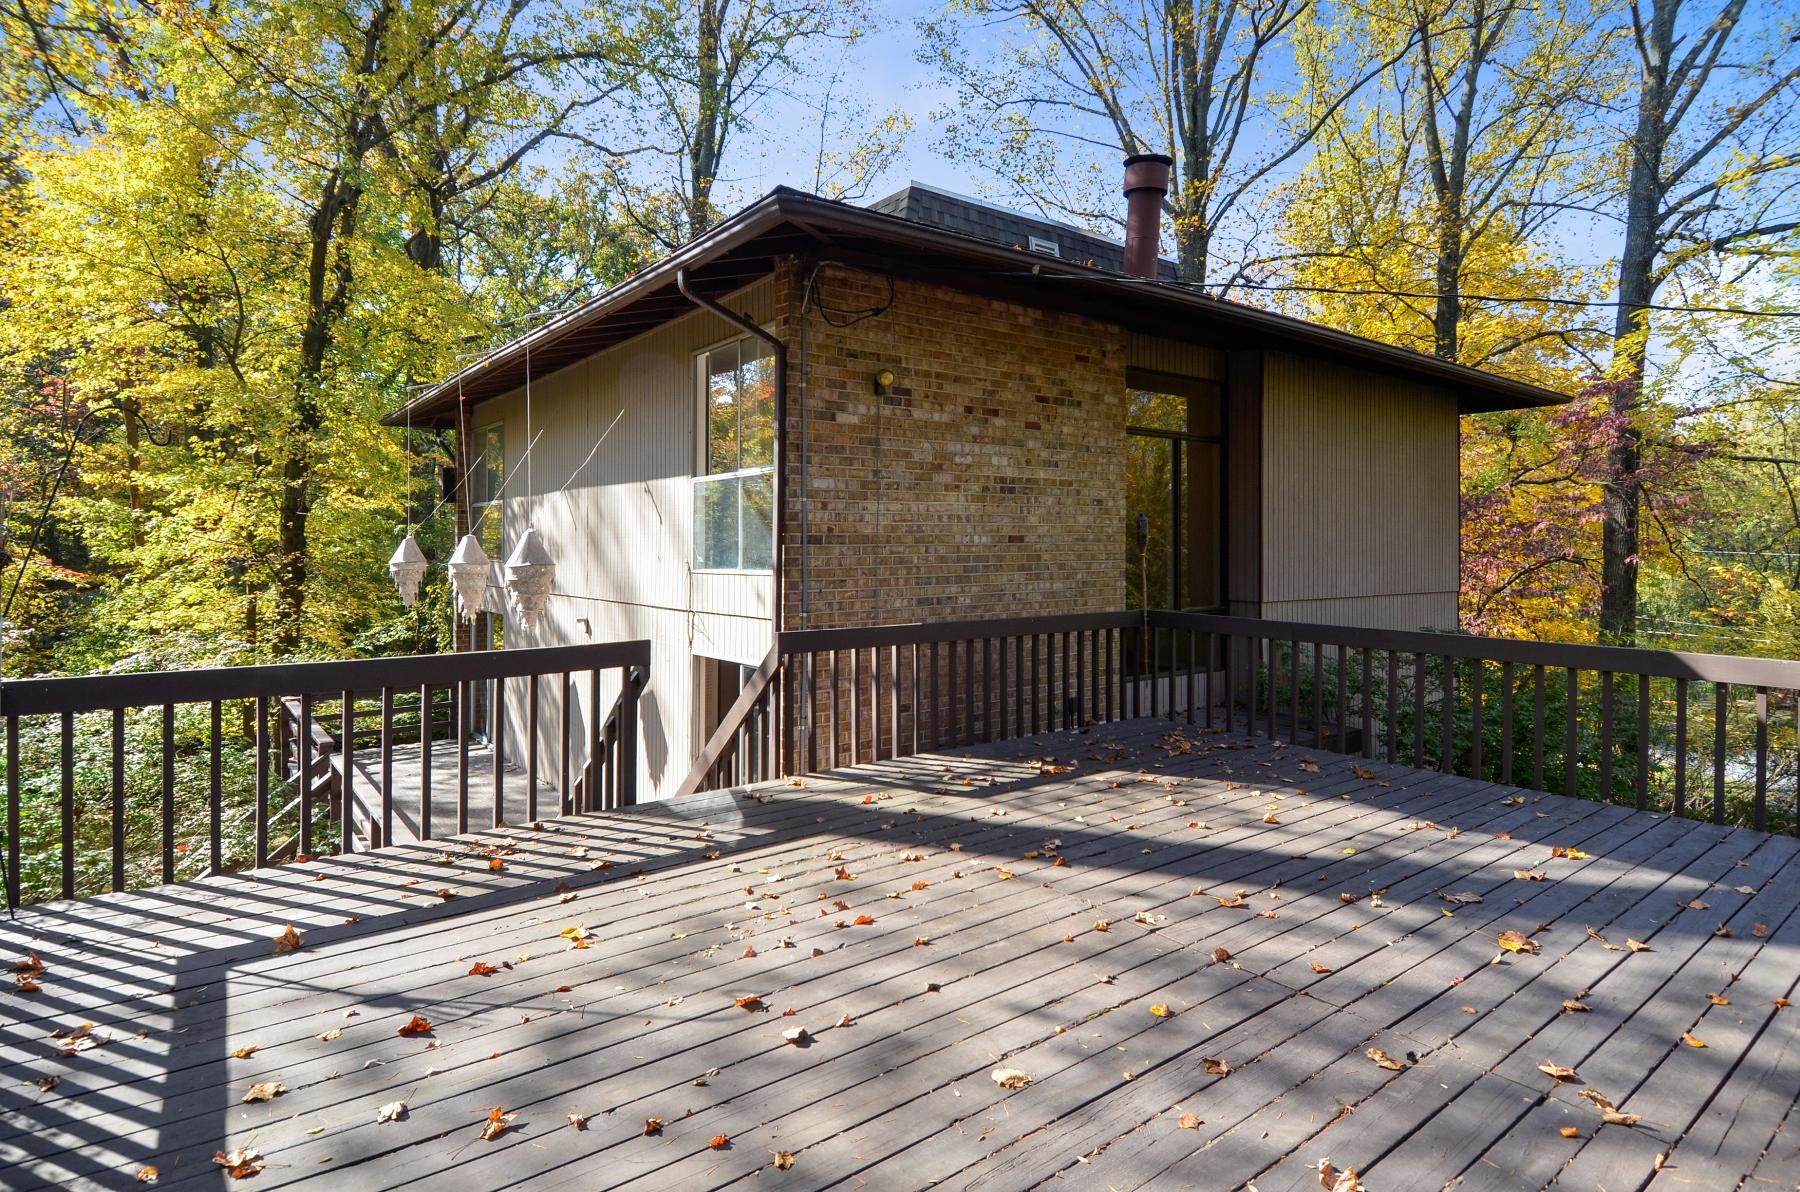 Additional photo for property listing at 4 Delford Avenue, Silver Spring  Silver Spring, Μεριλαντ 20904 Ηνωμενεσ Πολιτειεσ